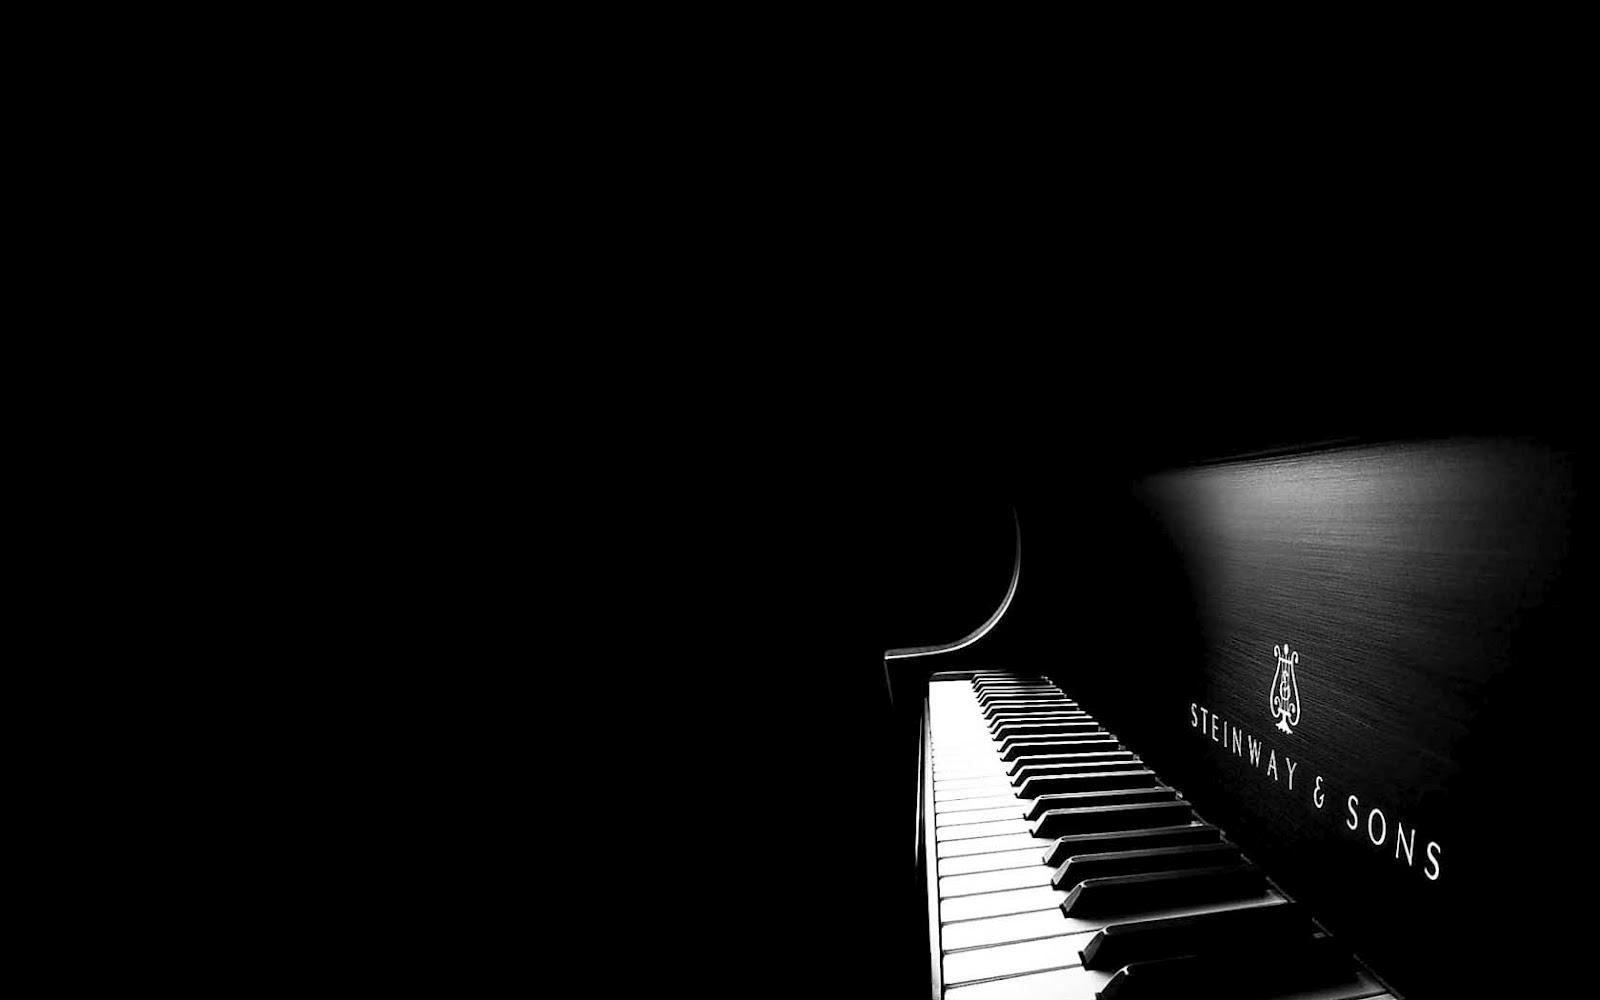 http://3.bp.blogspot.com/-TGr8kElo54Q/UGhDYR6clEI/AAAAAAAAE8g/vLQv82v4Rqc/s1600/Steinway-and-Sons-Piano-Close-Up-Psupero-HD-Wallpaper--Vvallpaper.Net.jpg